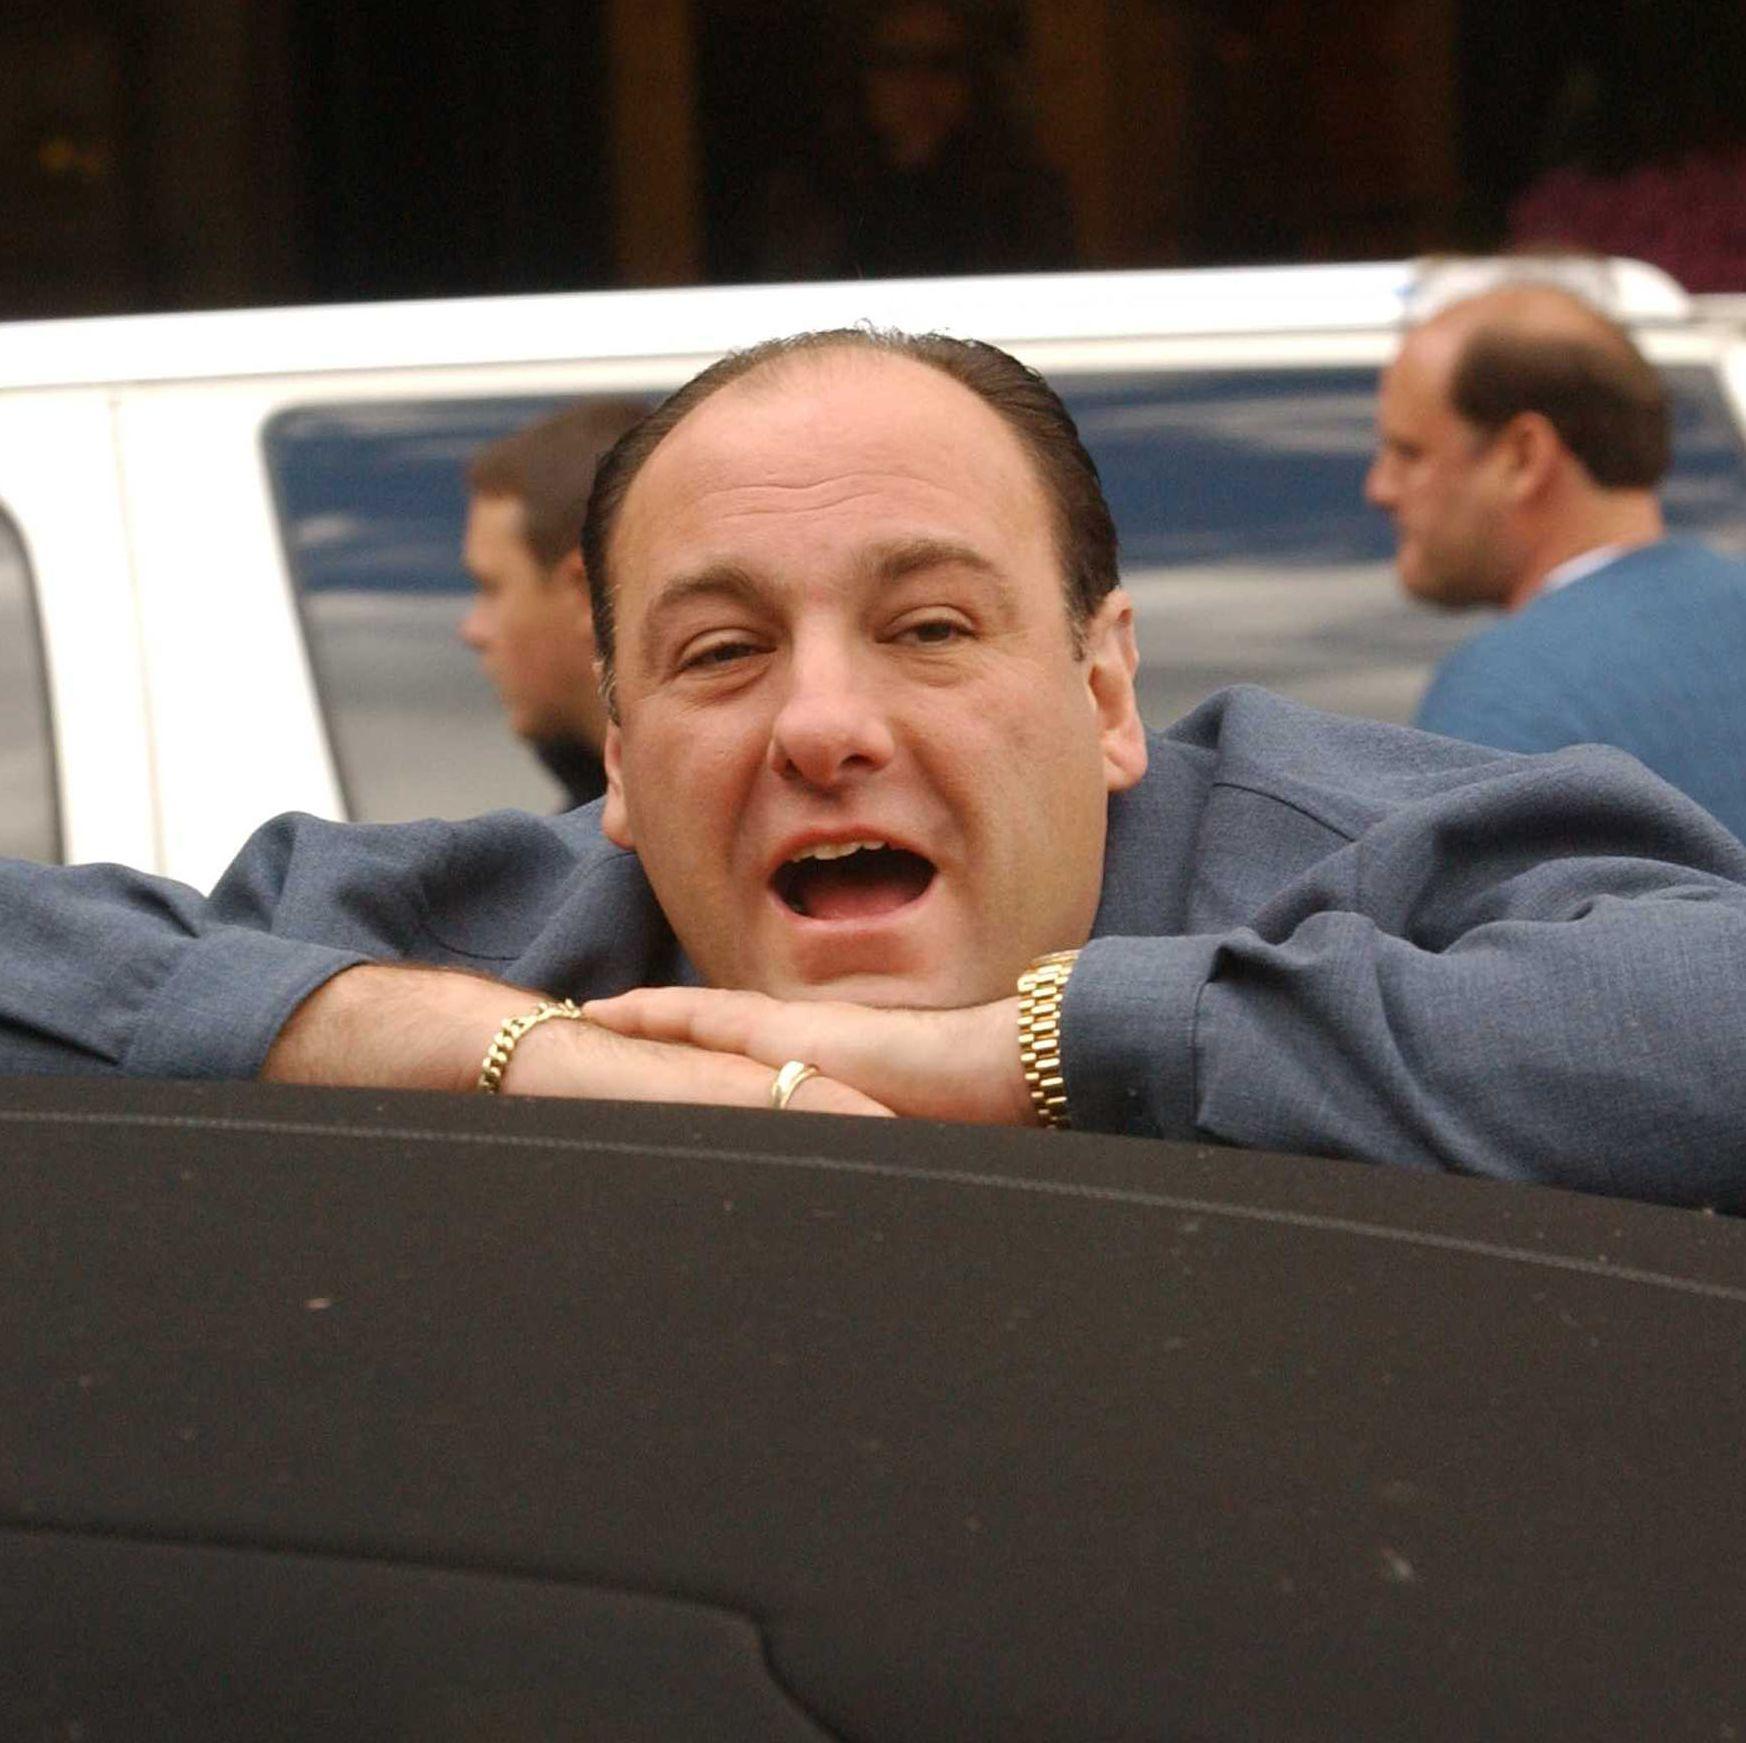 45 Rare Photos From the Set of 'The Sopranos'